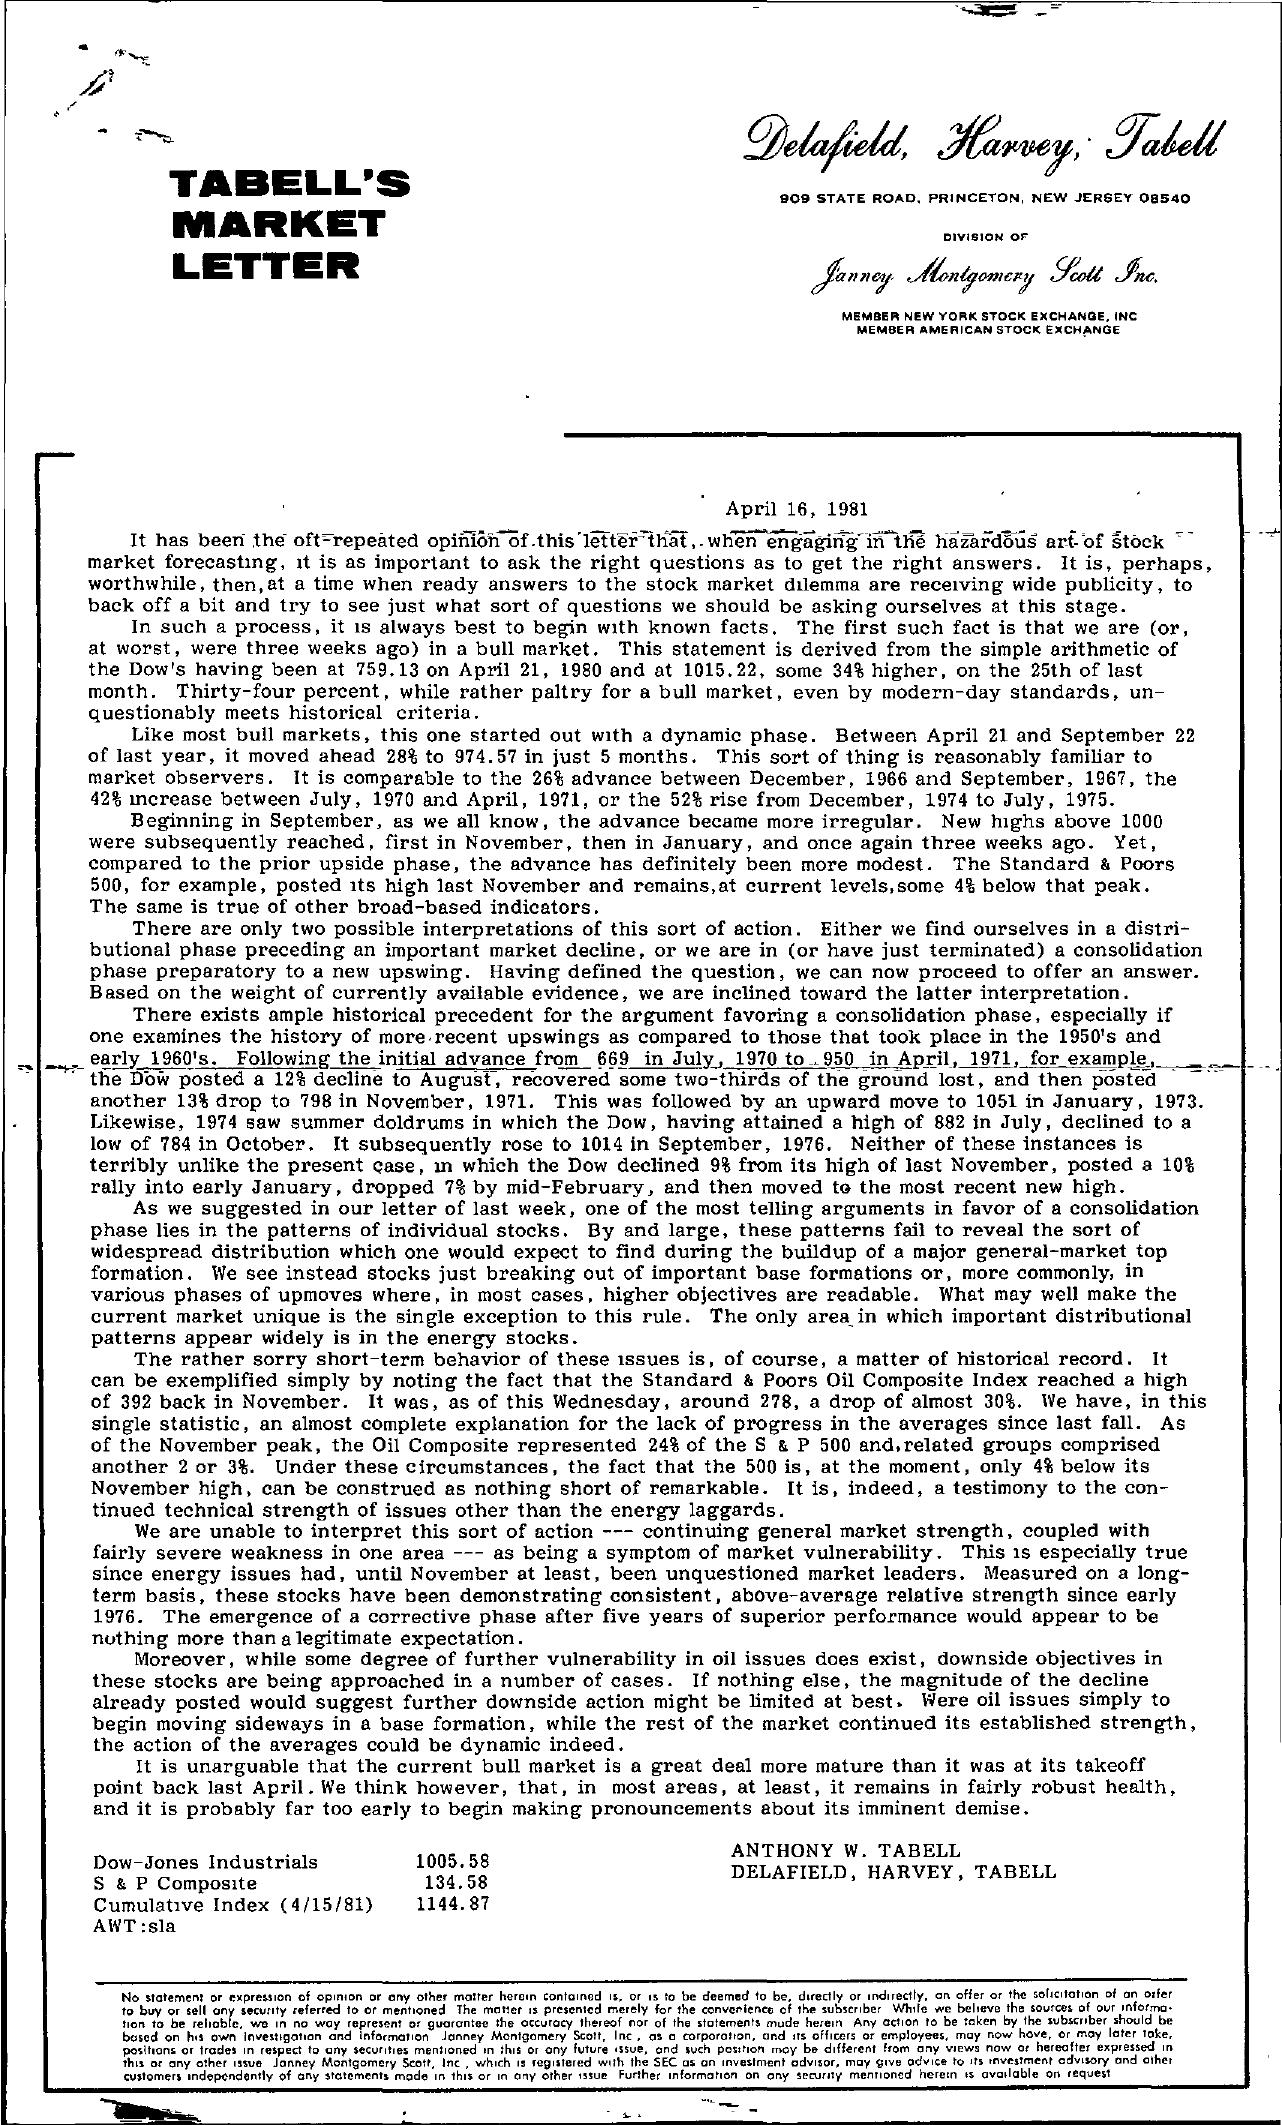 Tabell's Market Letter - April 16, 1981